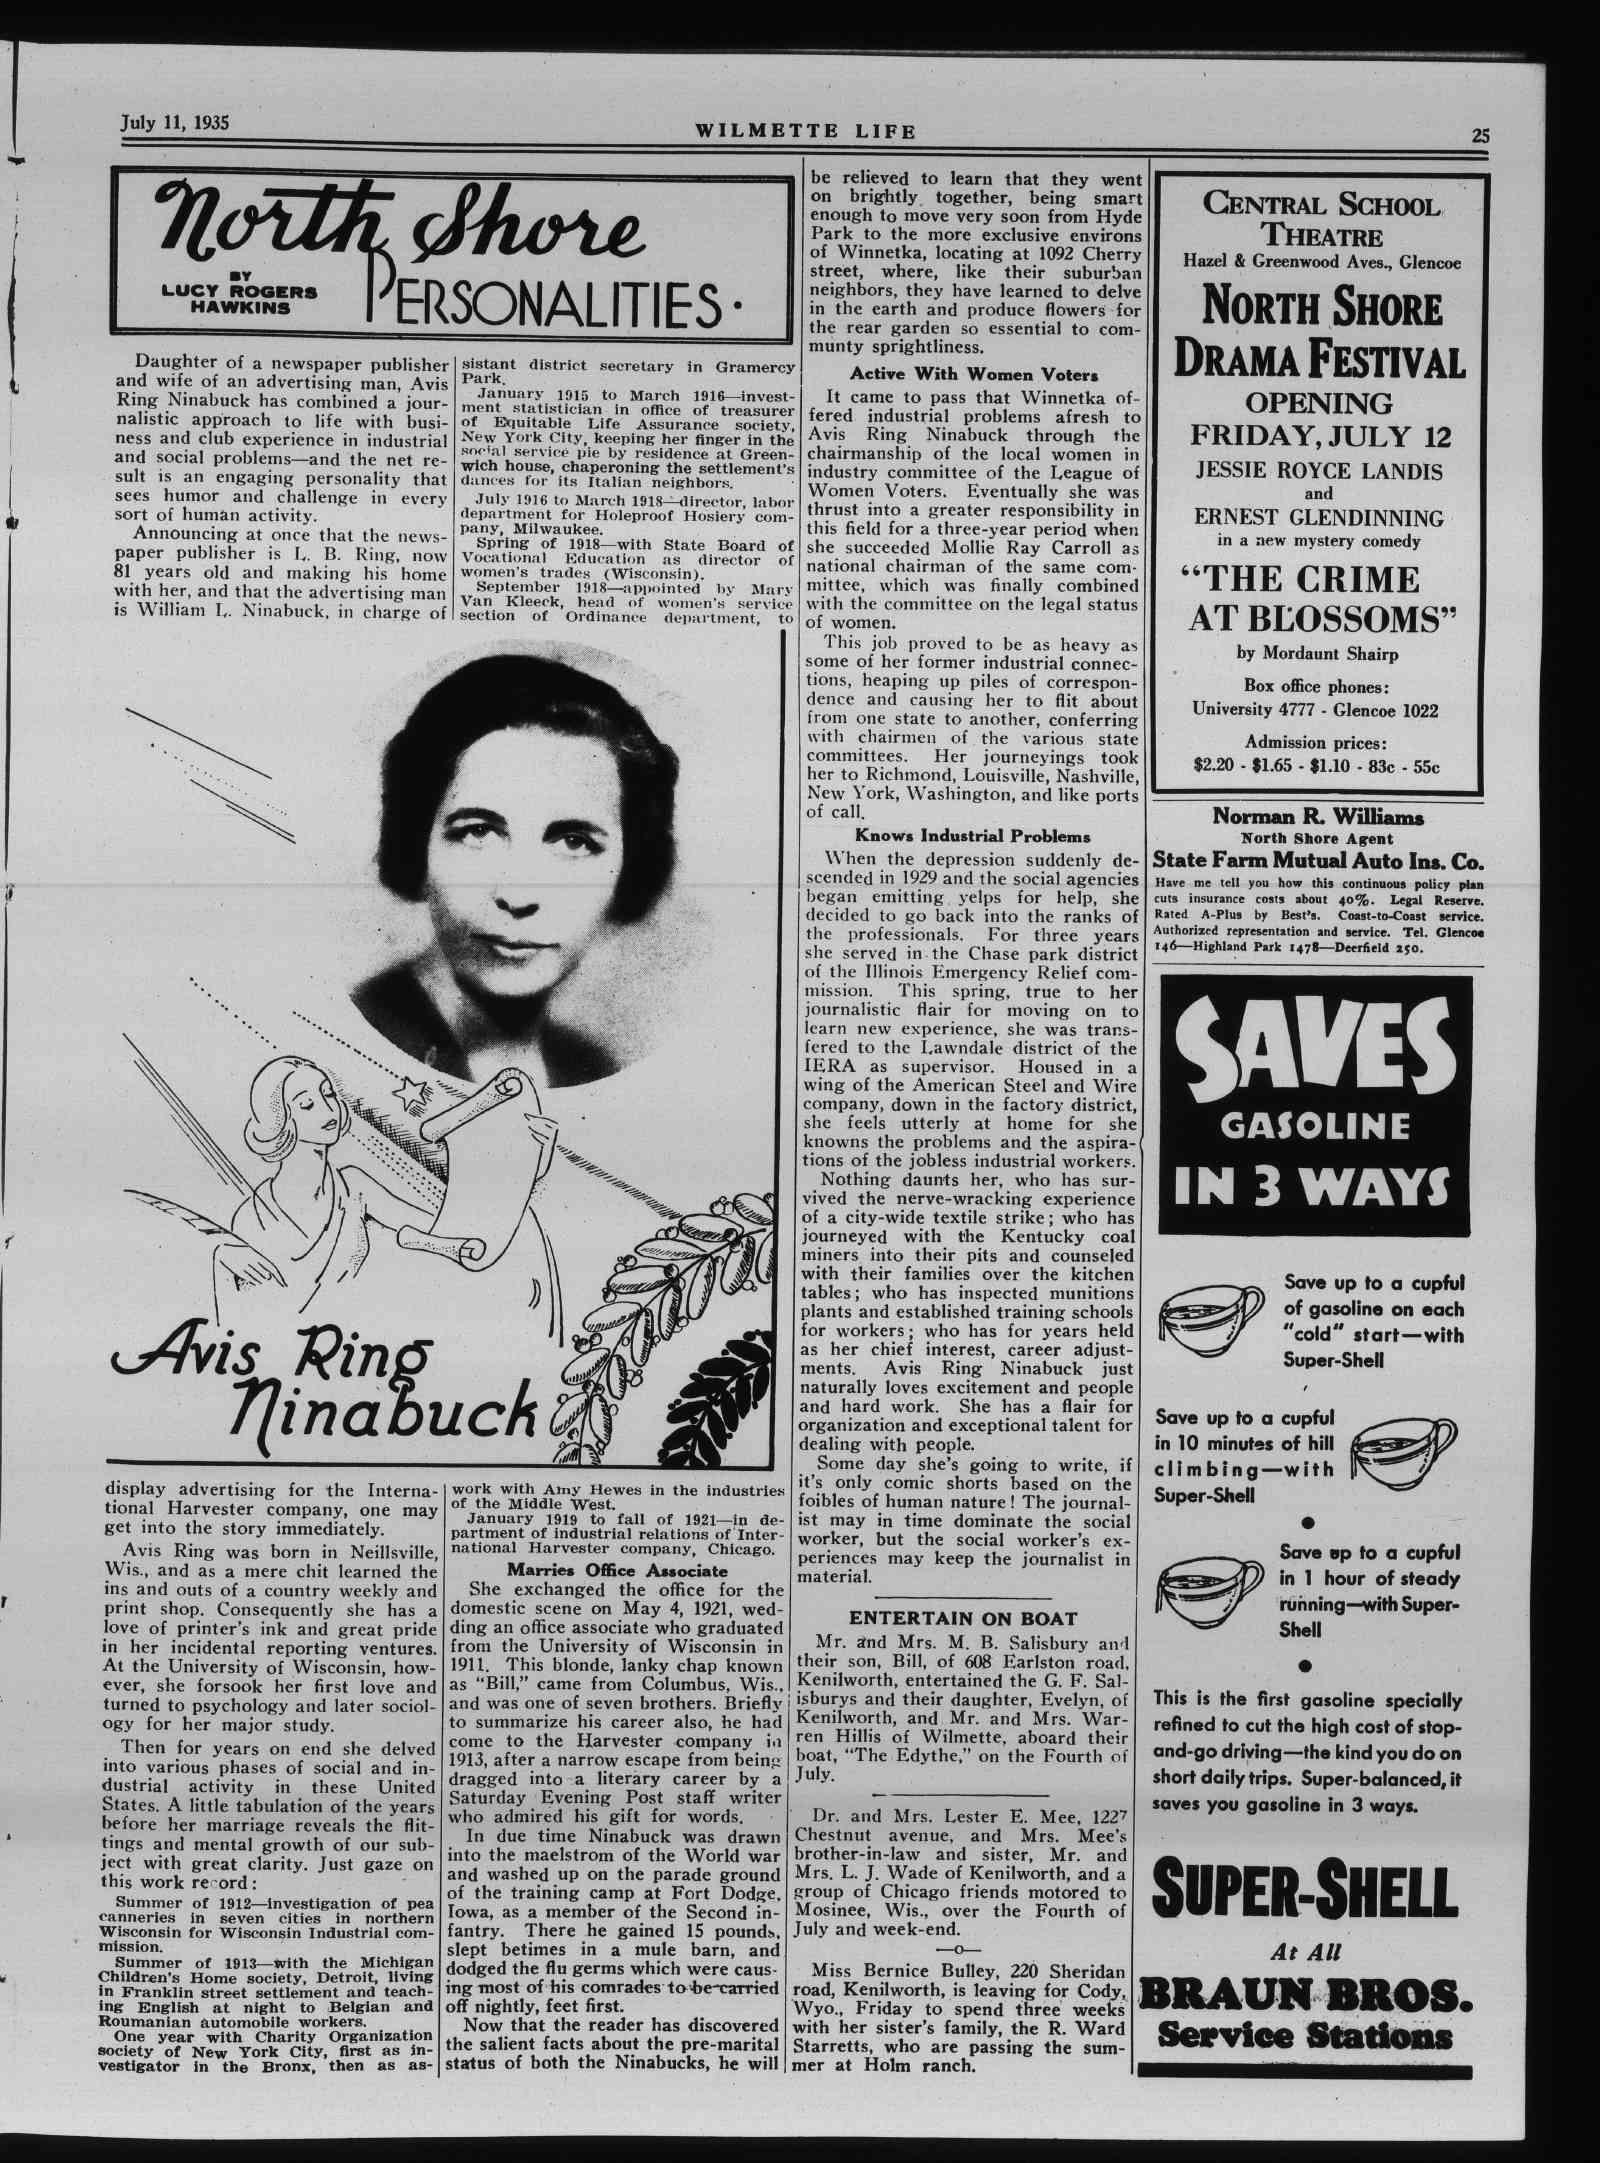 Wilmette Life (Wilmette, Illinois), 11 Jul 1935